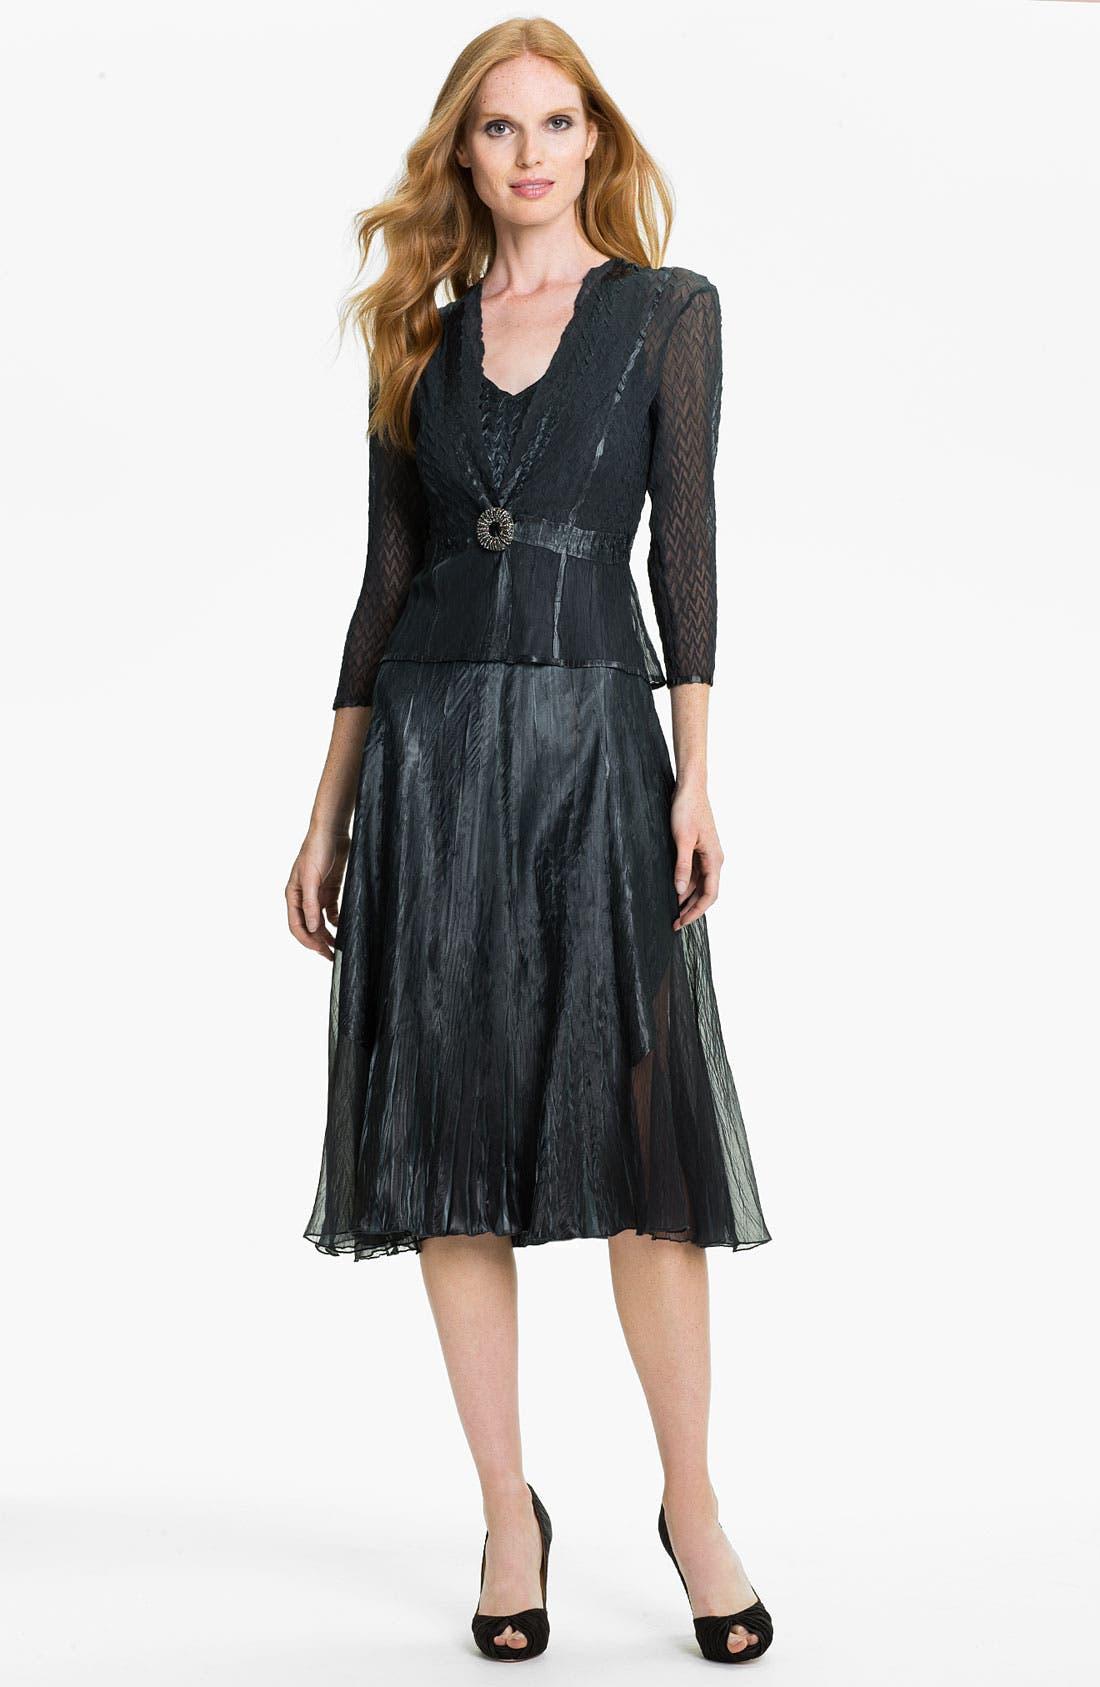 Alternate Image 1 Selected - Komarov V-Neck Textured Charmeuse Dress & Chiffon Jacket